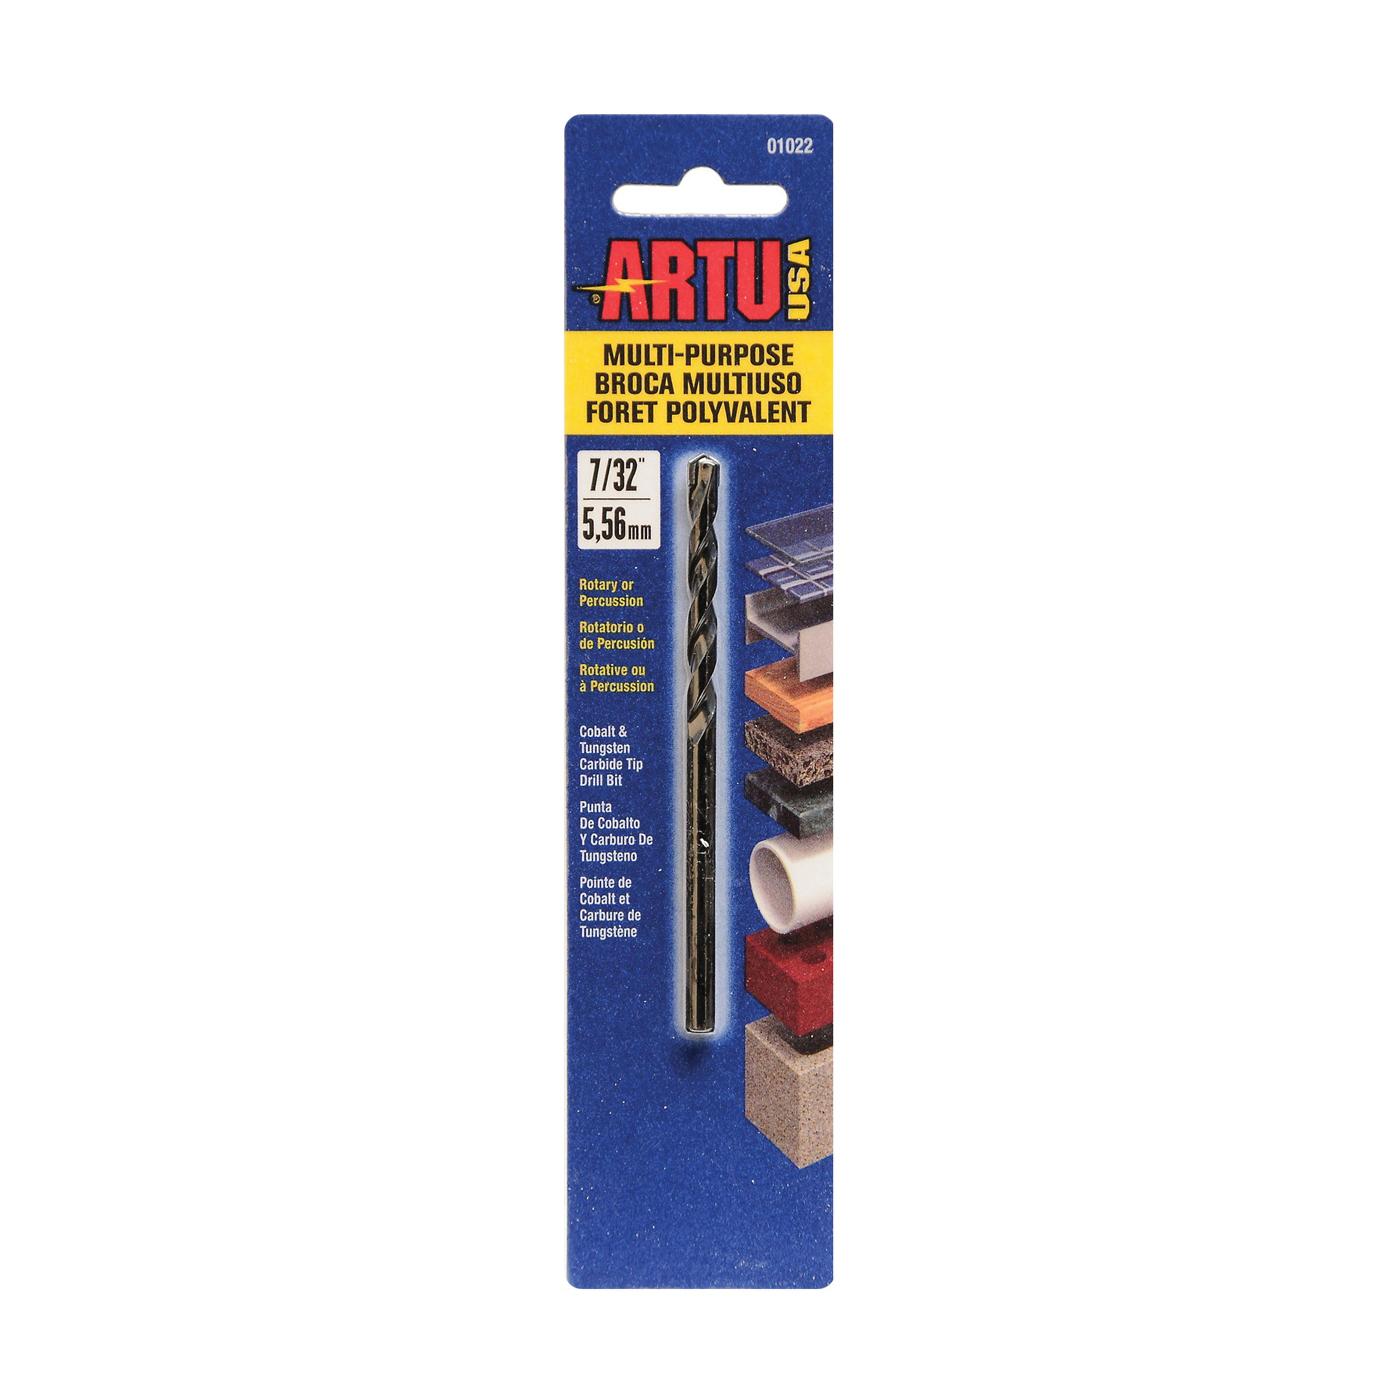 Picture of ARTU 01022 Drill Bit, 7/32 in Dia, 3-3/4 in OAL, Jobber Bit, Parabolic Flute, 7/32 in Dia Shank, Straight Shank